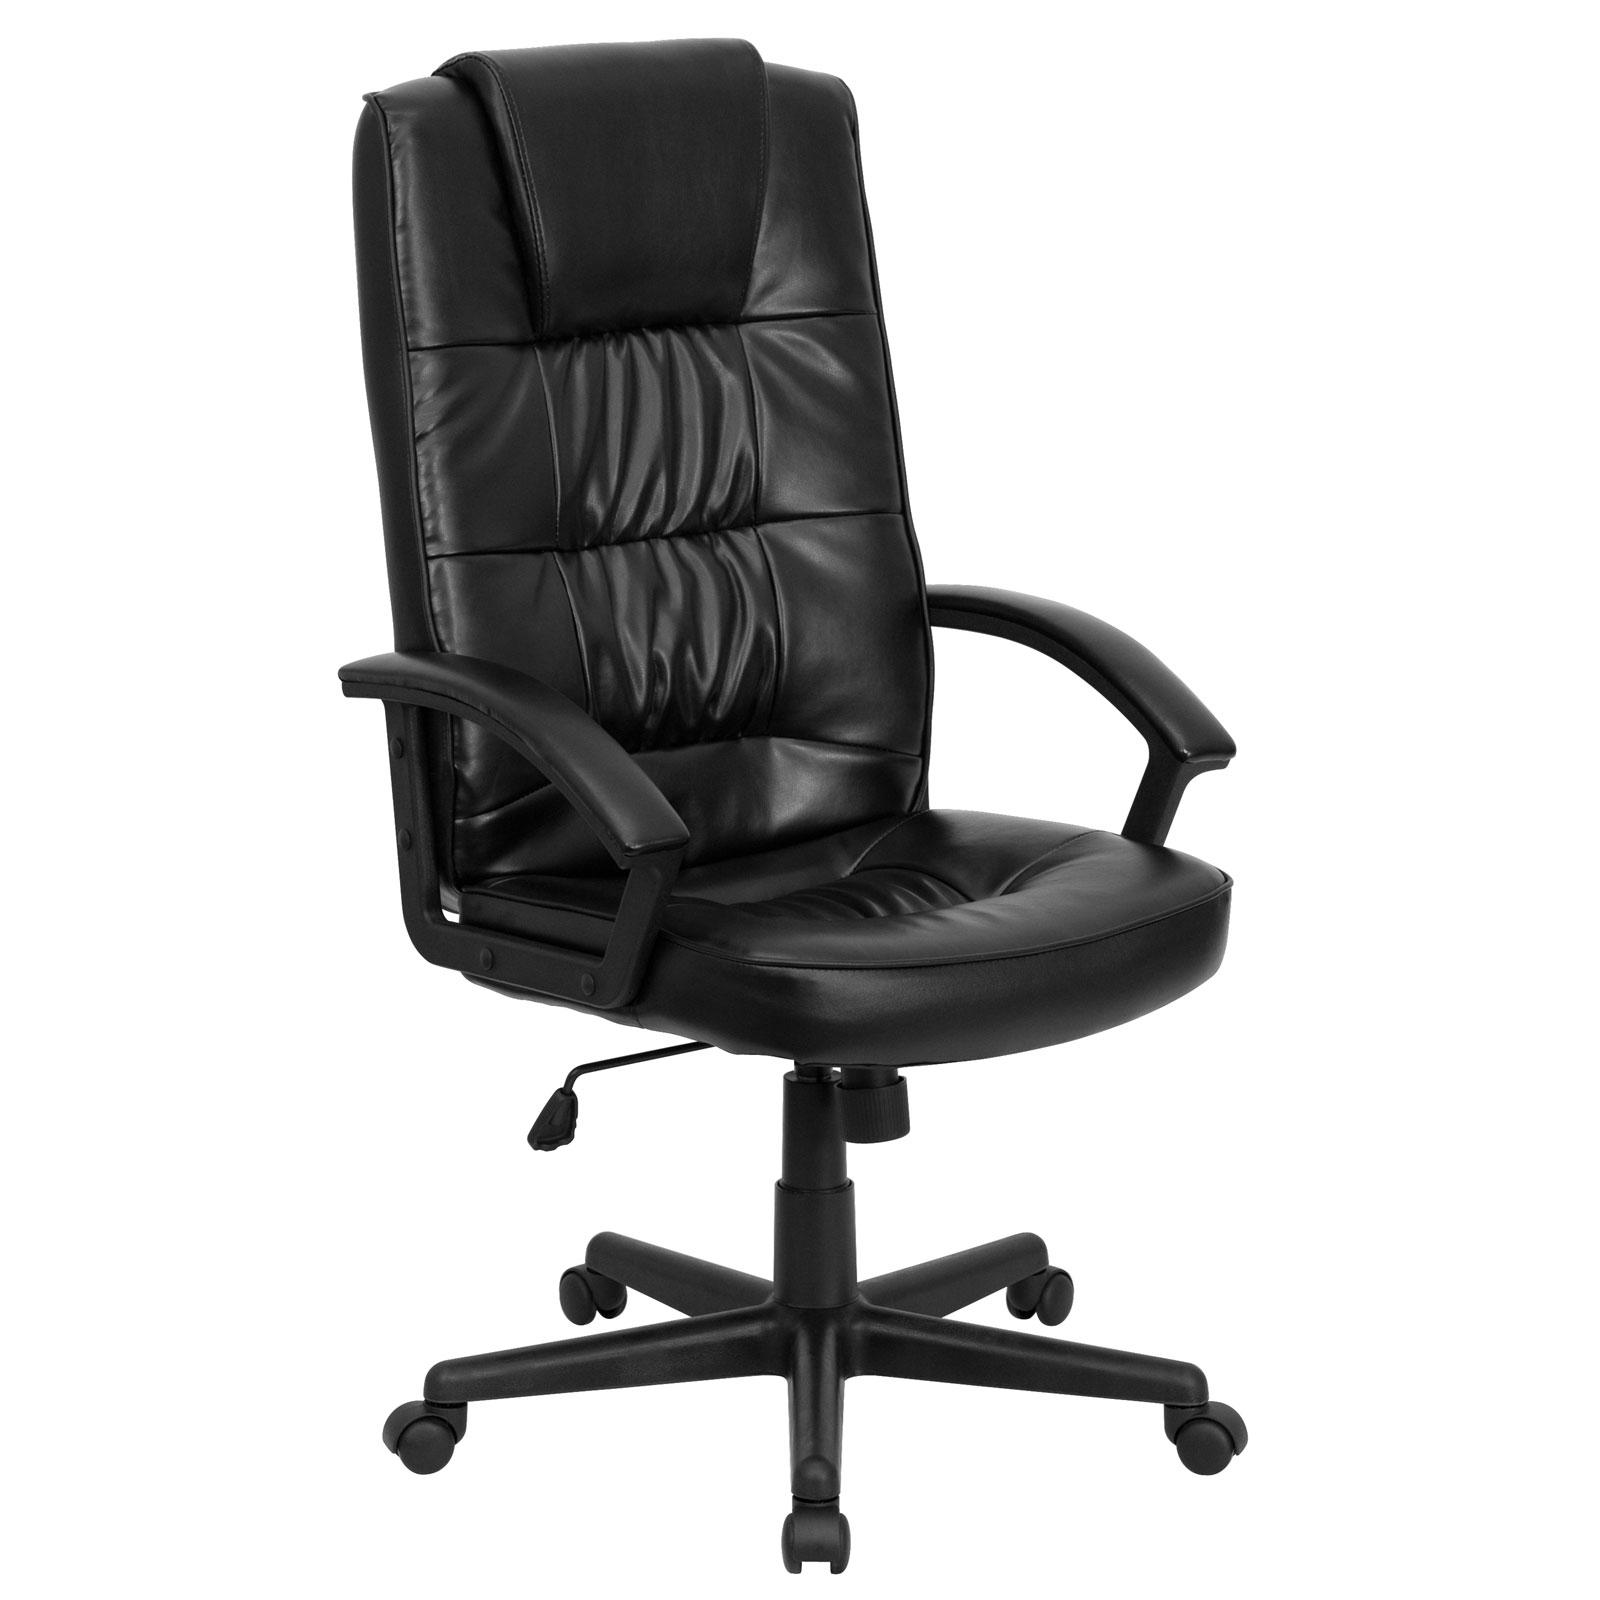 High Back Black Bonded Leather Executive Office Chair by ... Black Office Chair Back View